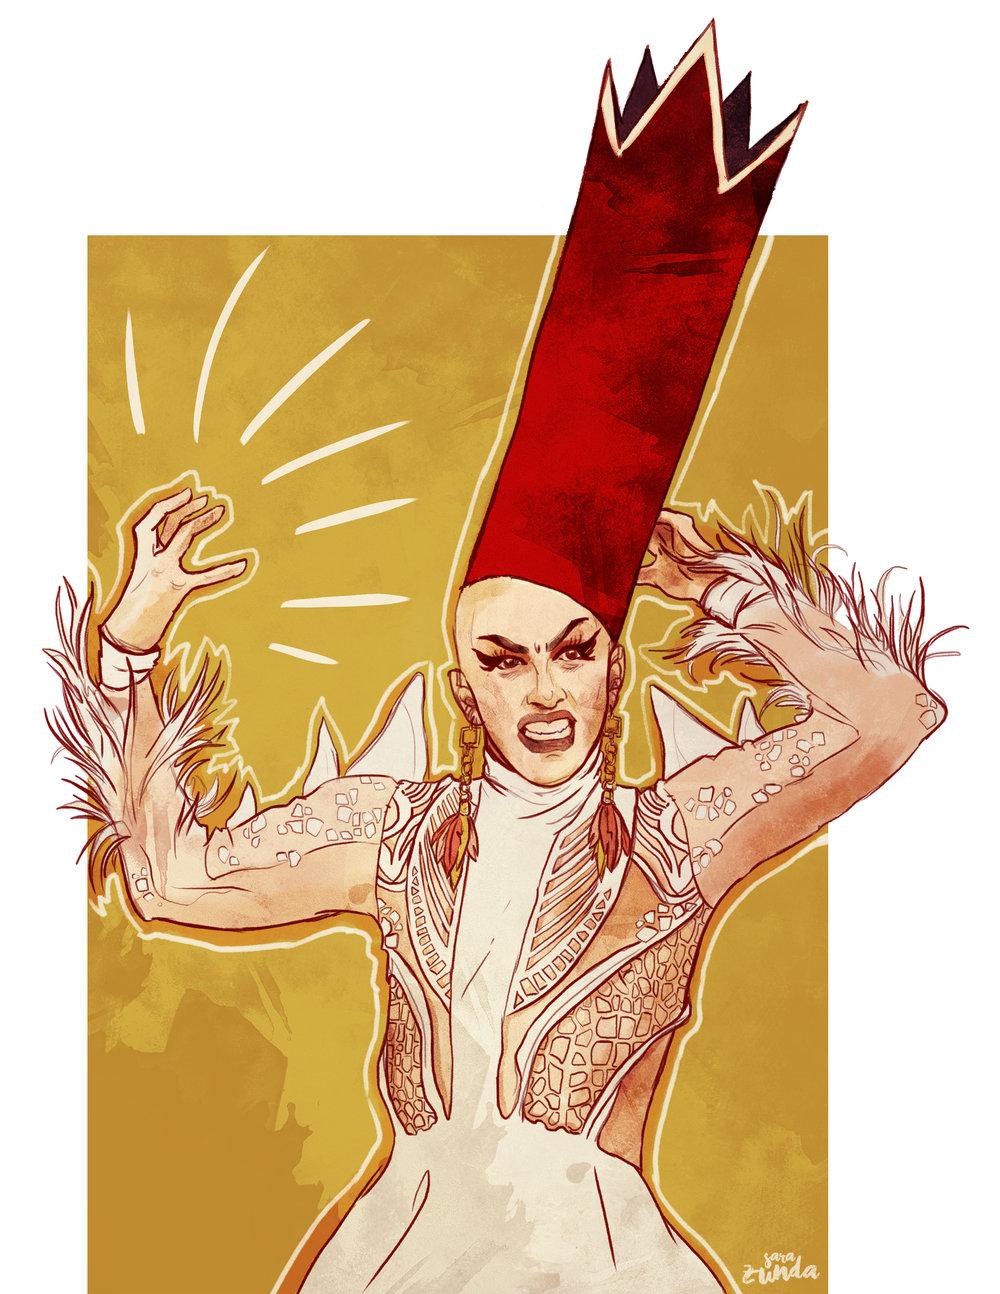 Velour  Portrait of American drag queen and artist, Sasha Velour